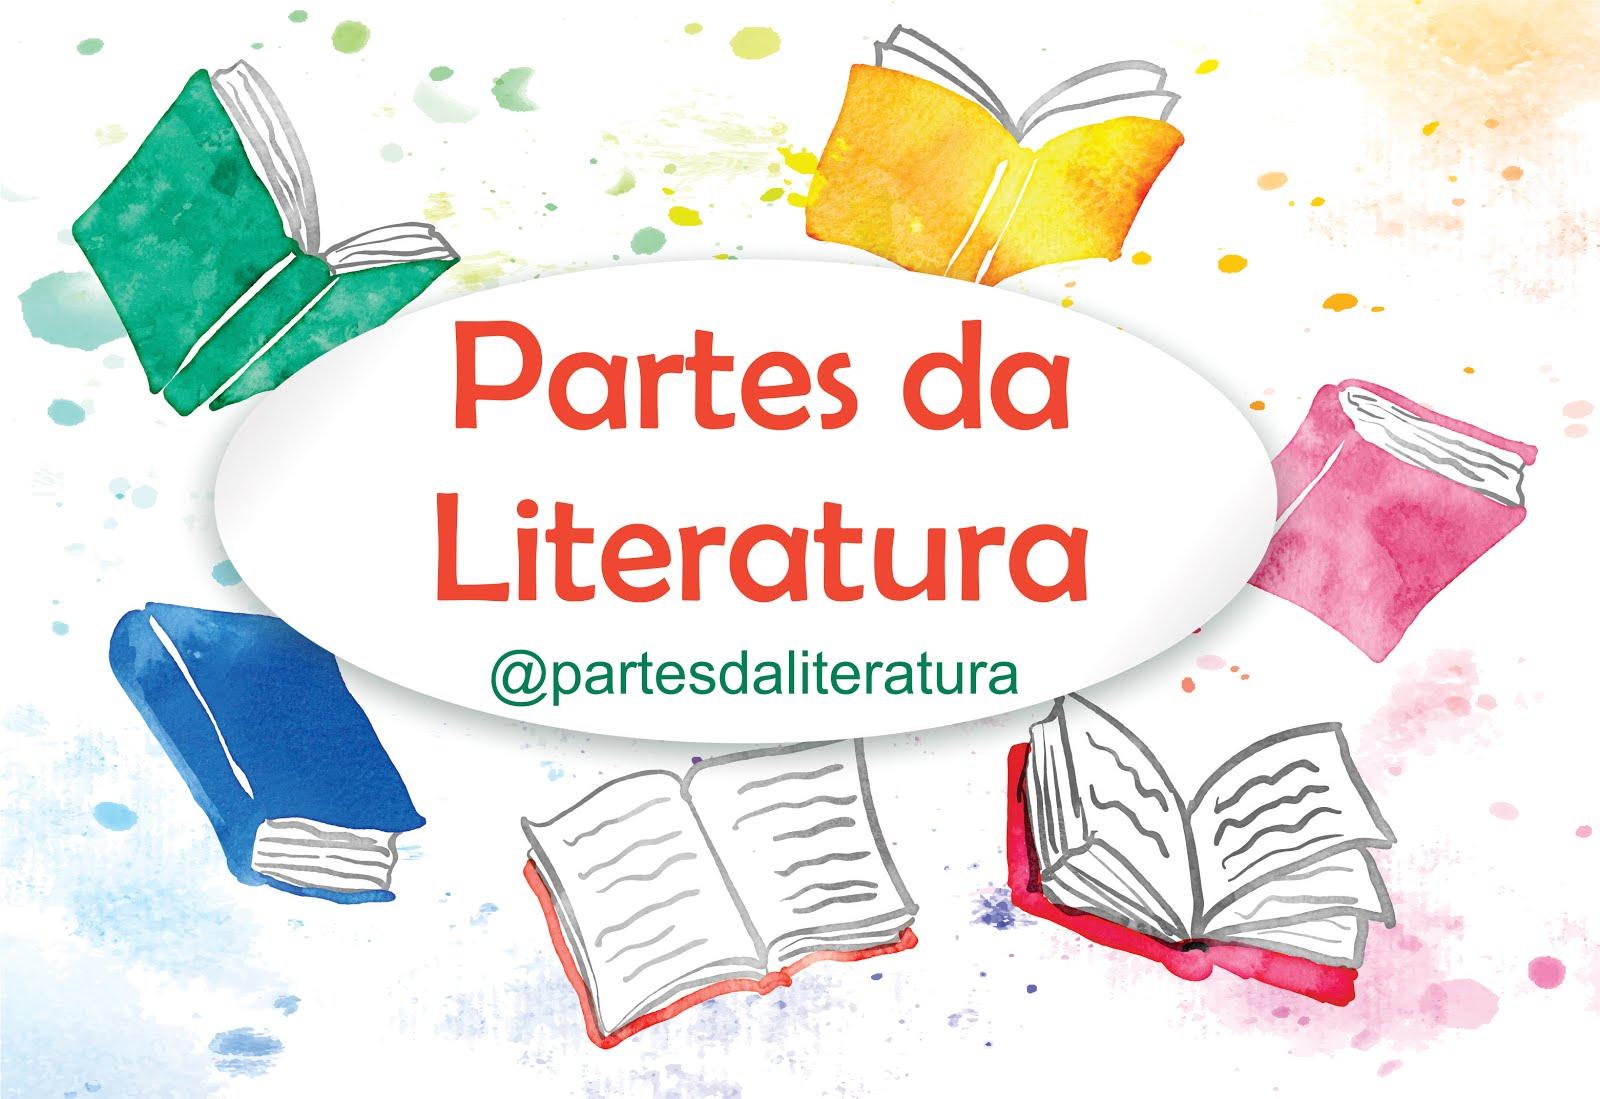 Partes da Literatura